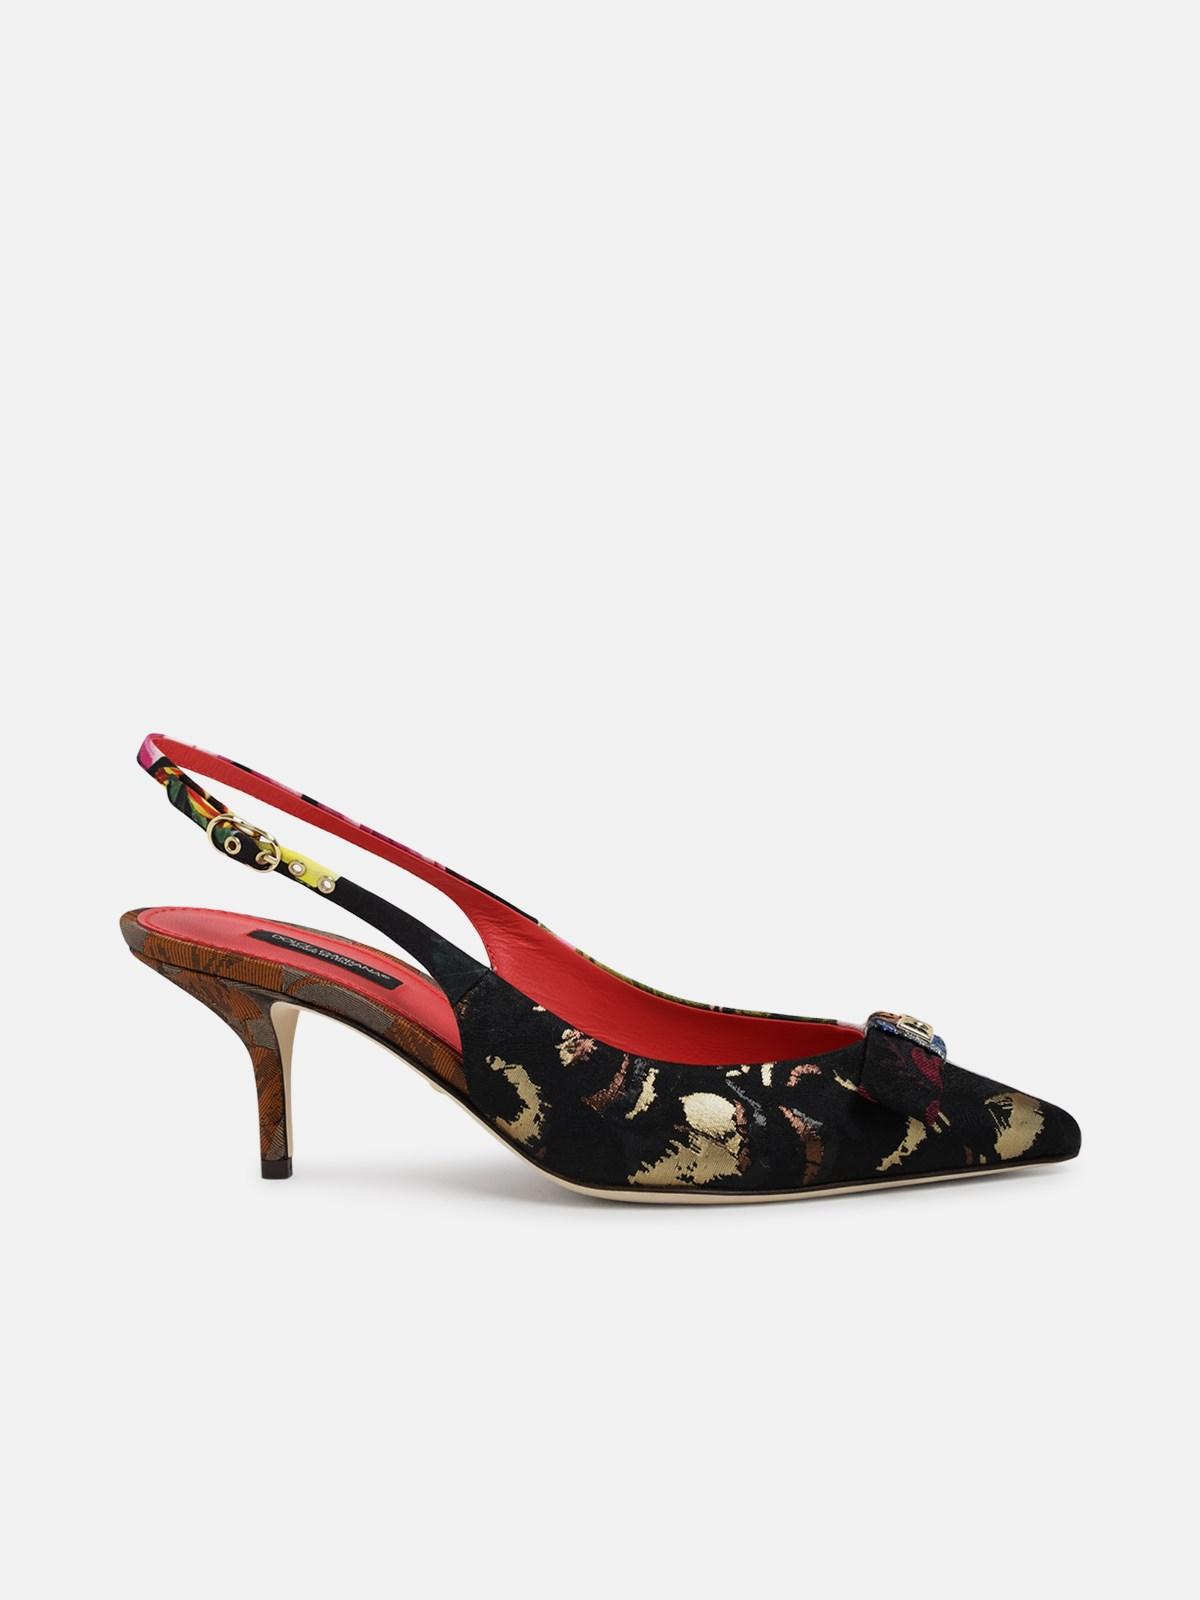 Dolce & Gabbana Mid heels MULTICOLOR SLINGBACK PUMPS